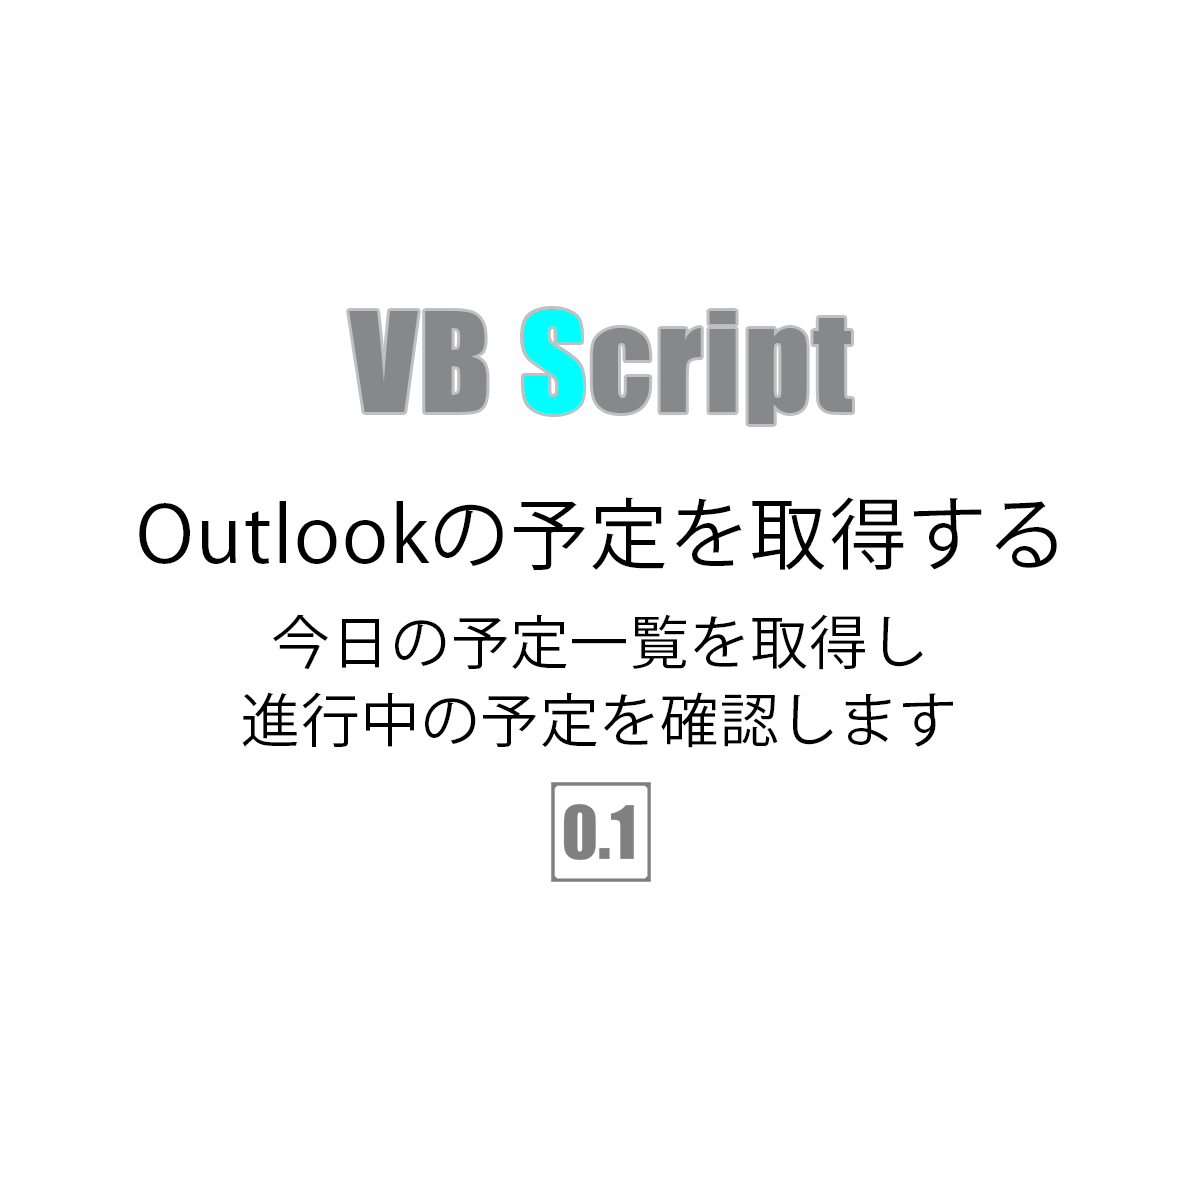 【1】Outlookの今日の予定一覧をVBSで取得し、進行中の予定を確認する